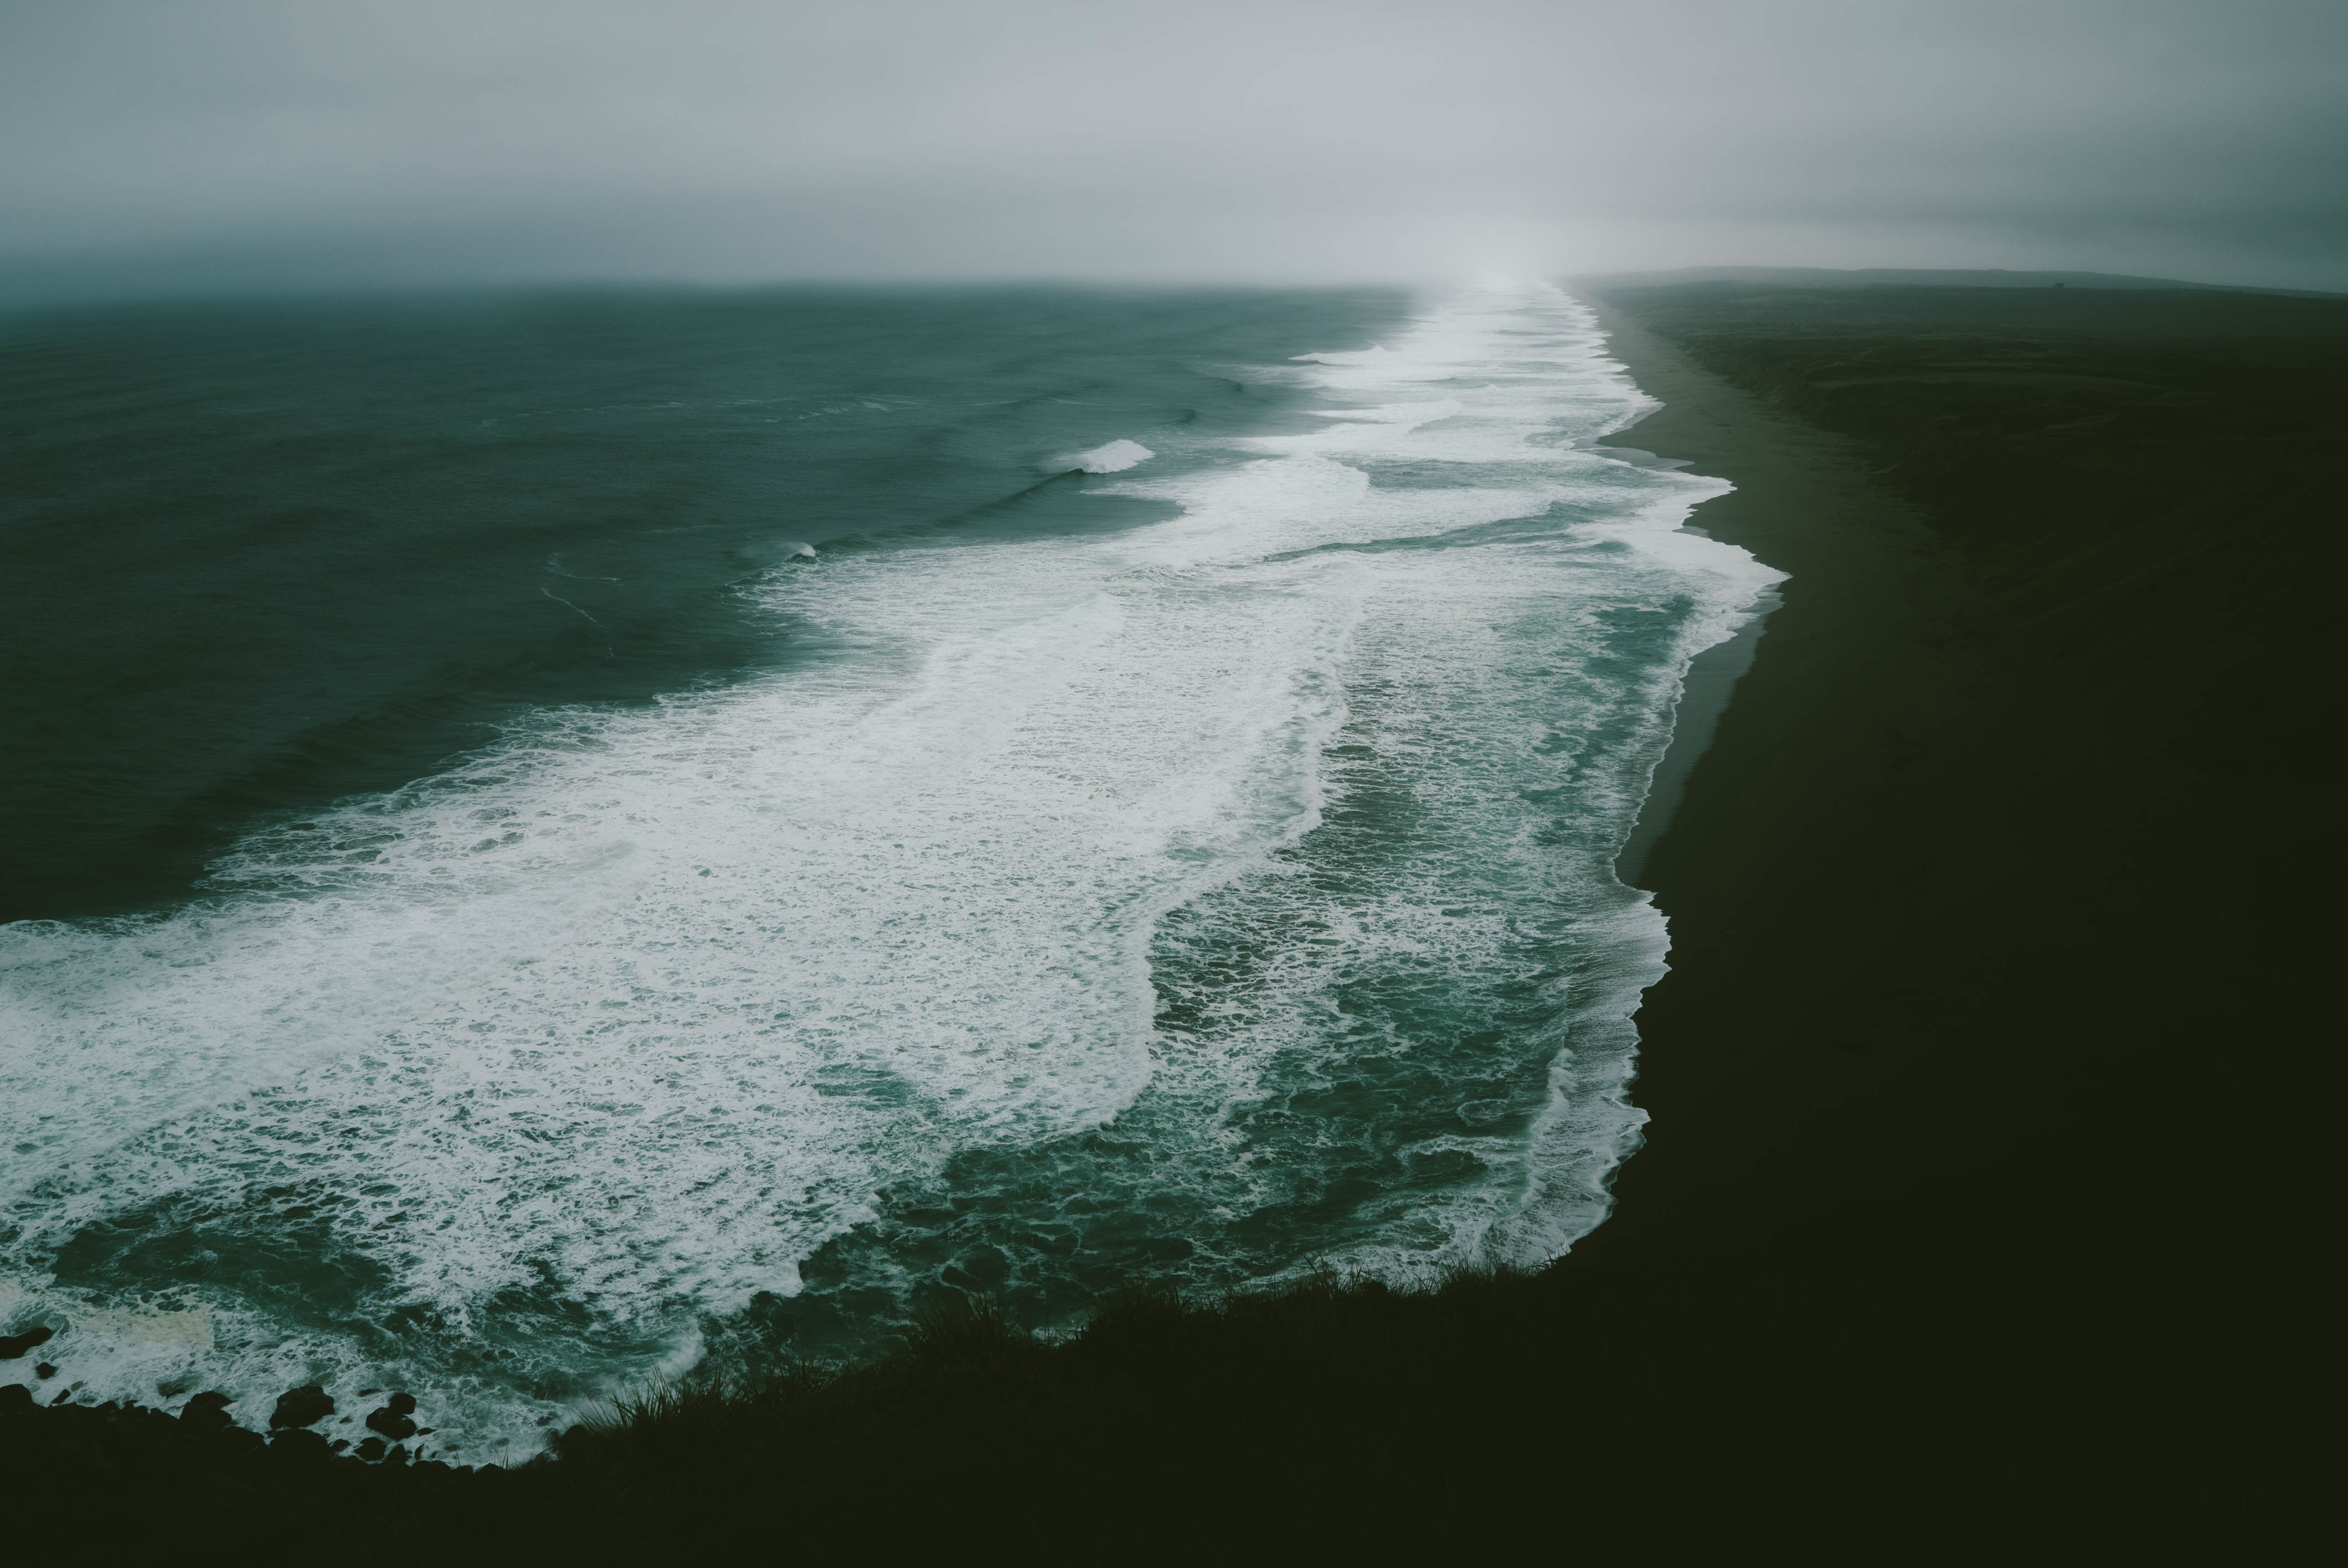 The shore photo